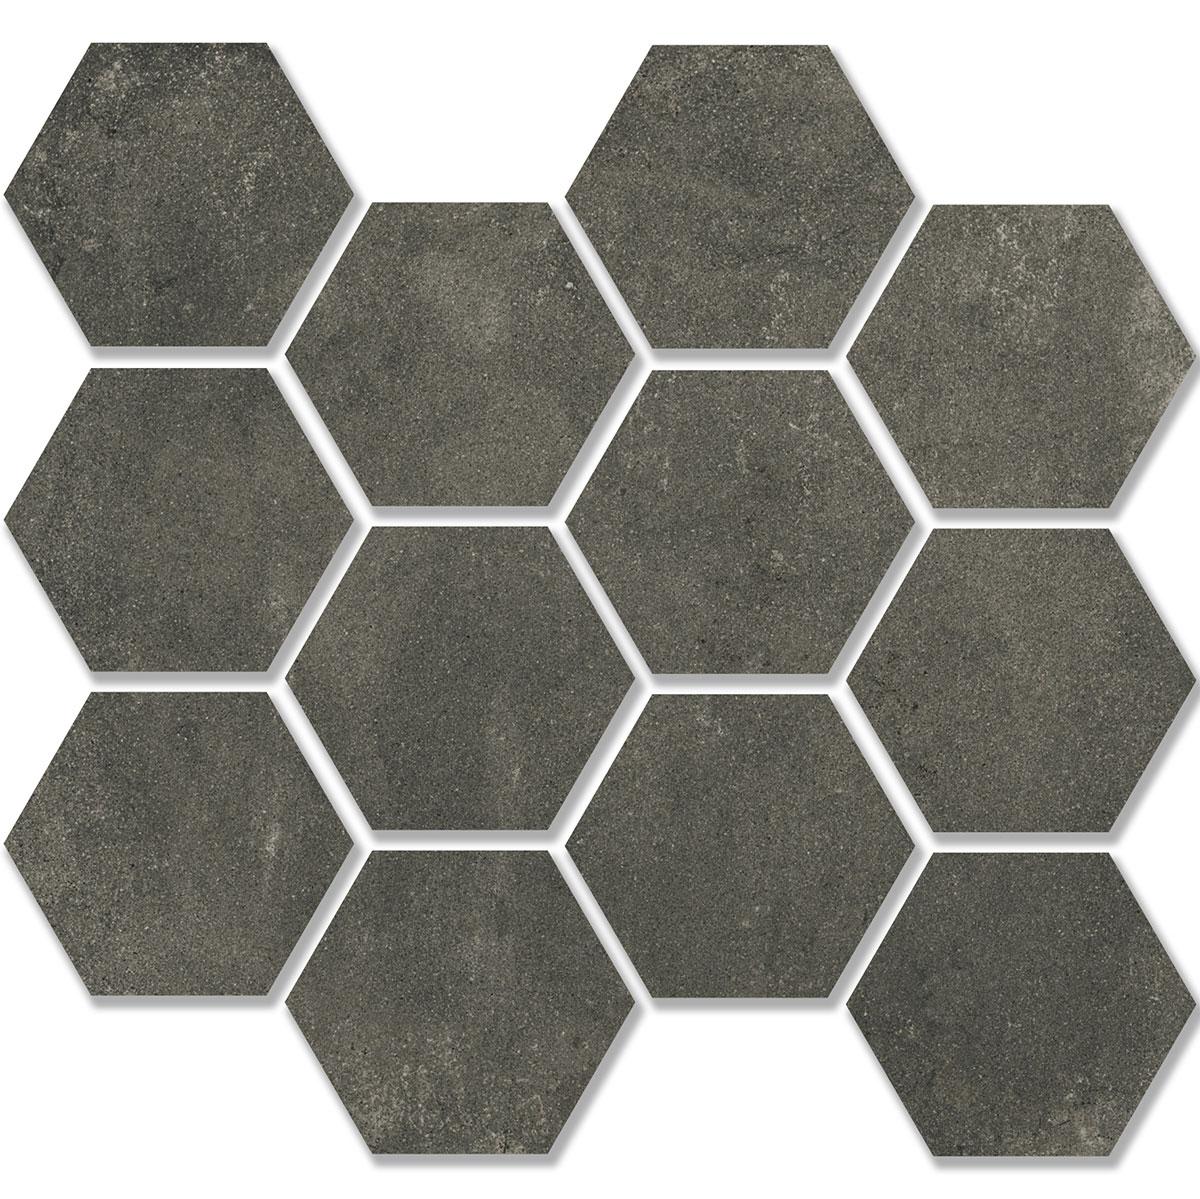 CAPETOWN peppercorn ash (grau) HEXA Image